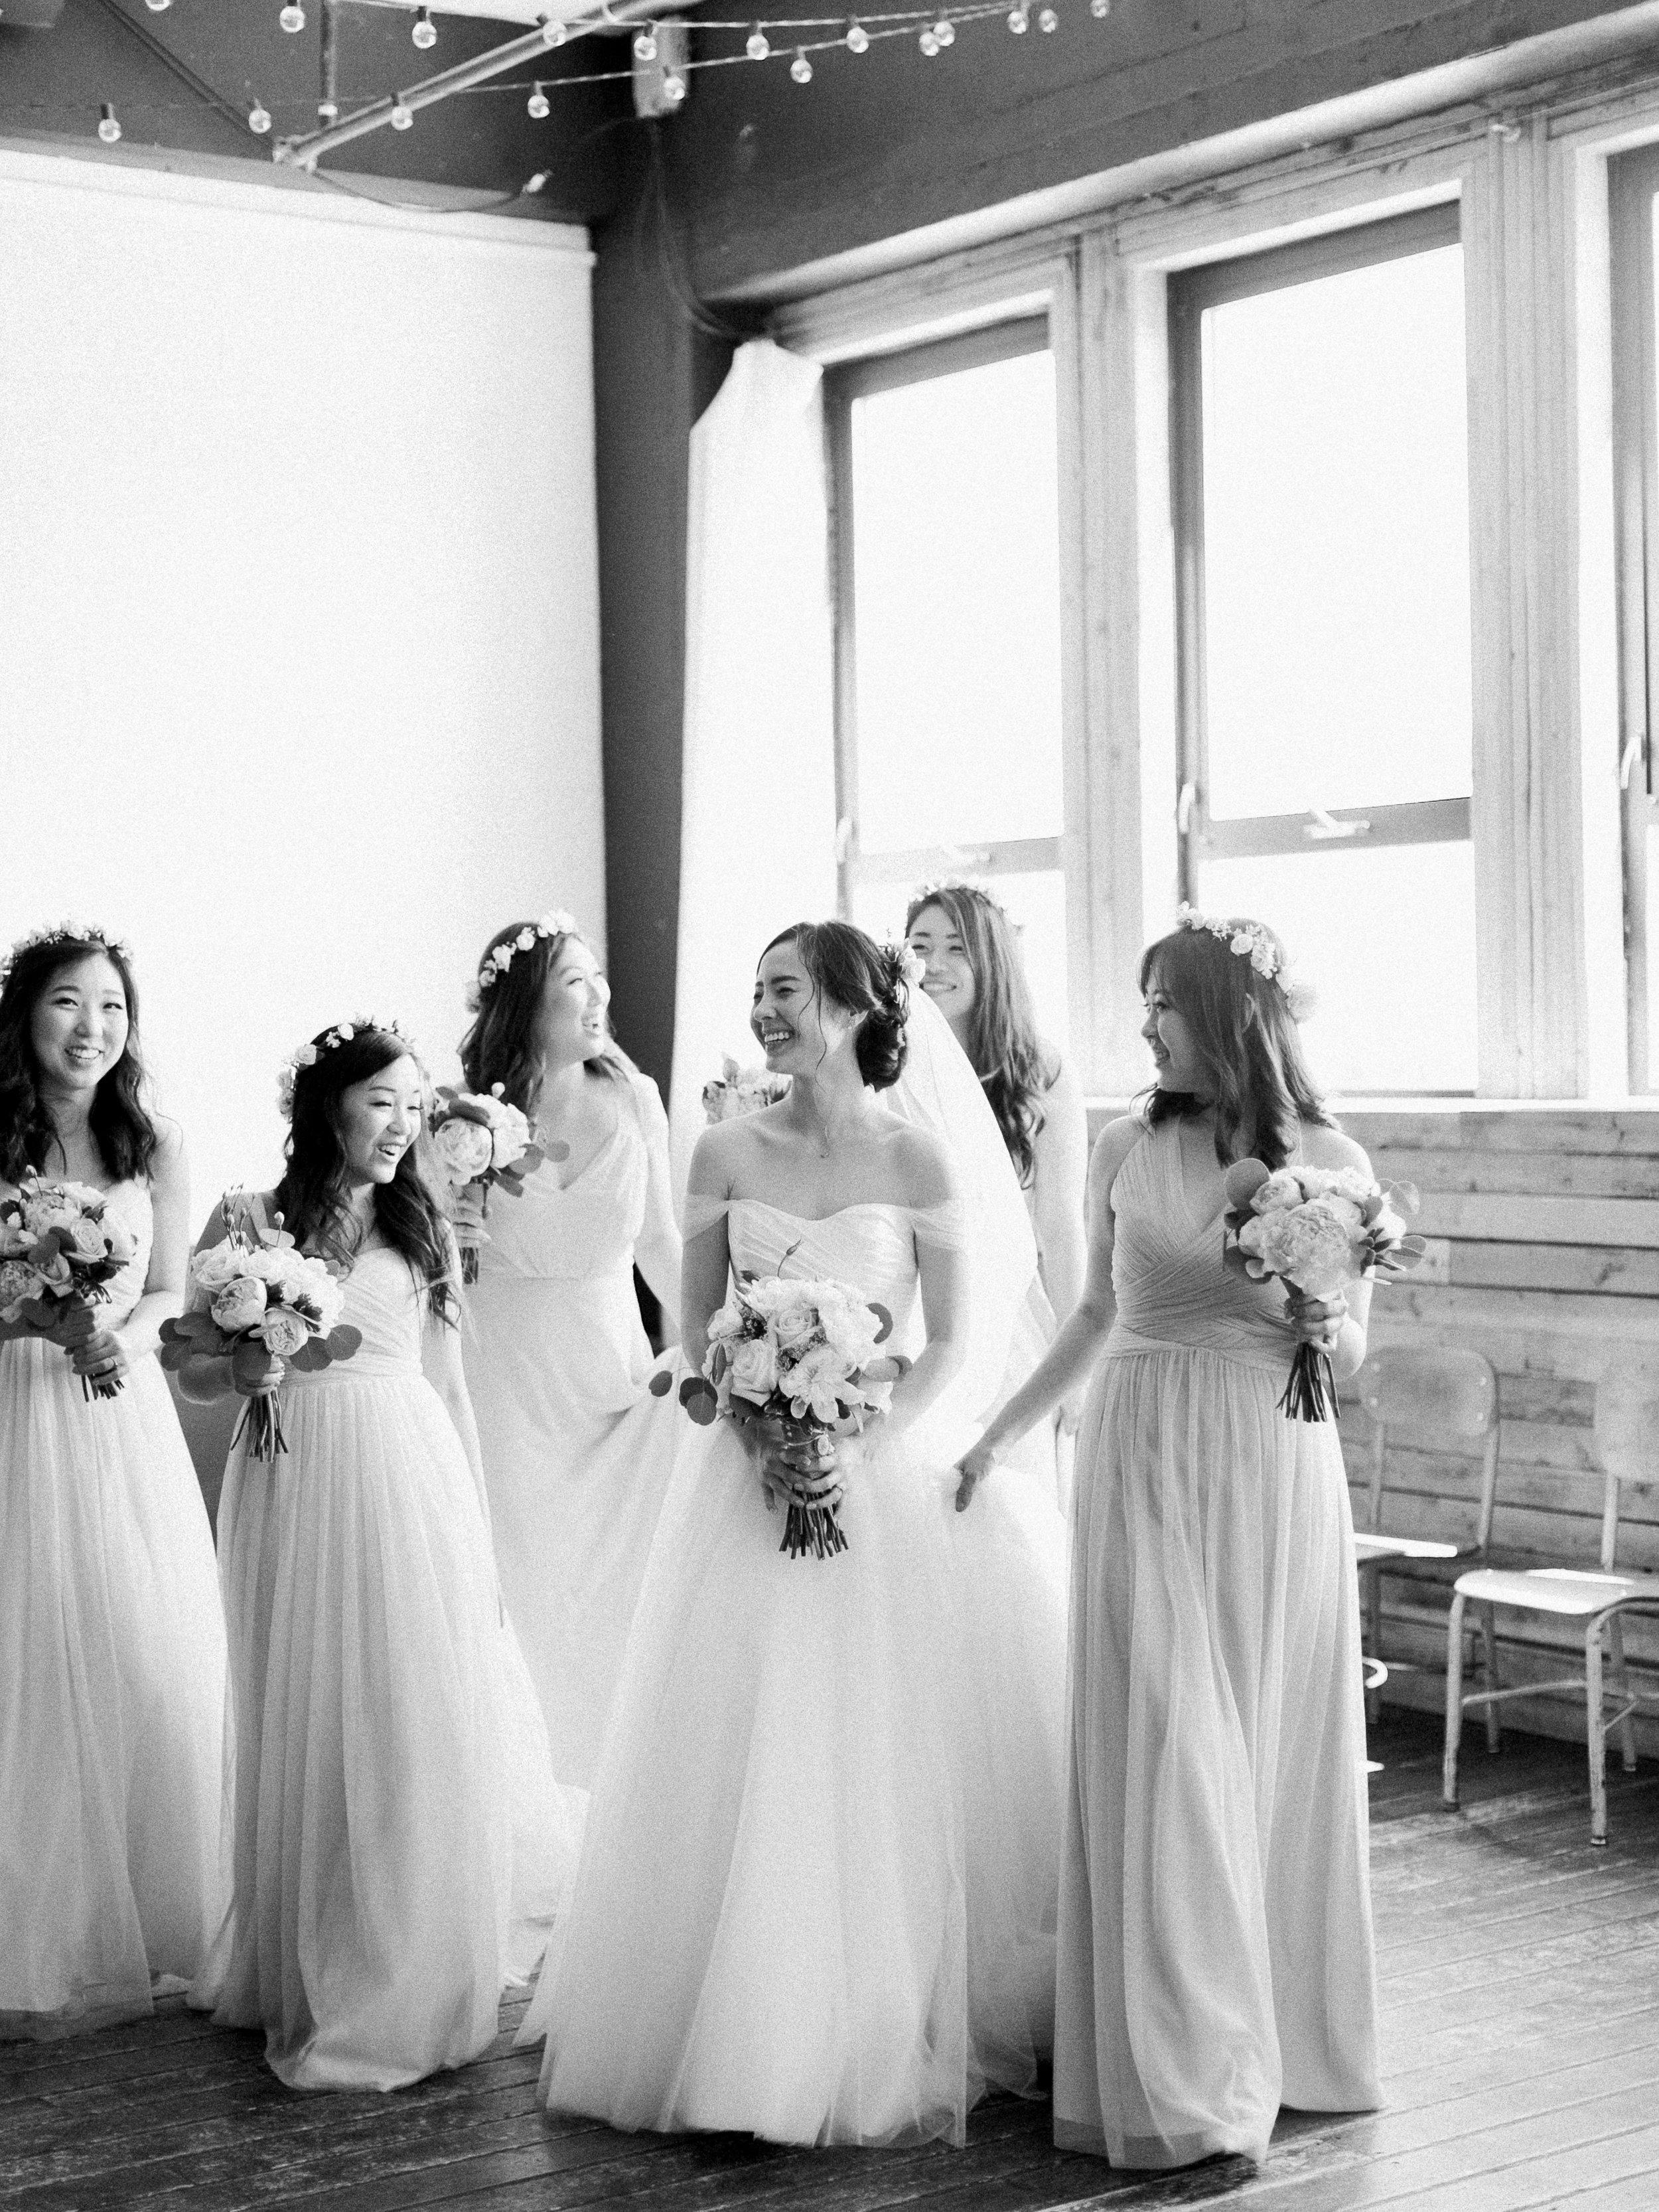 union-pine-wedding-portland-5.jpg